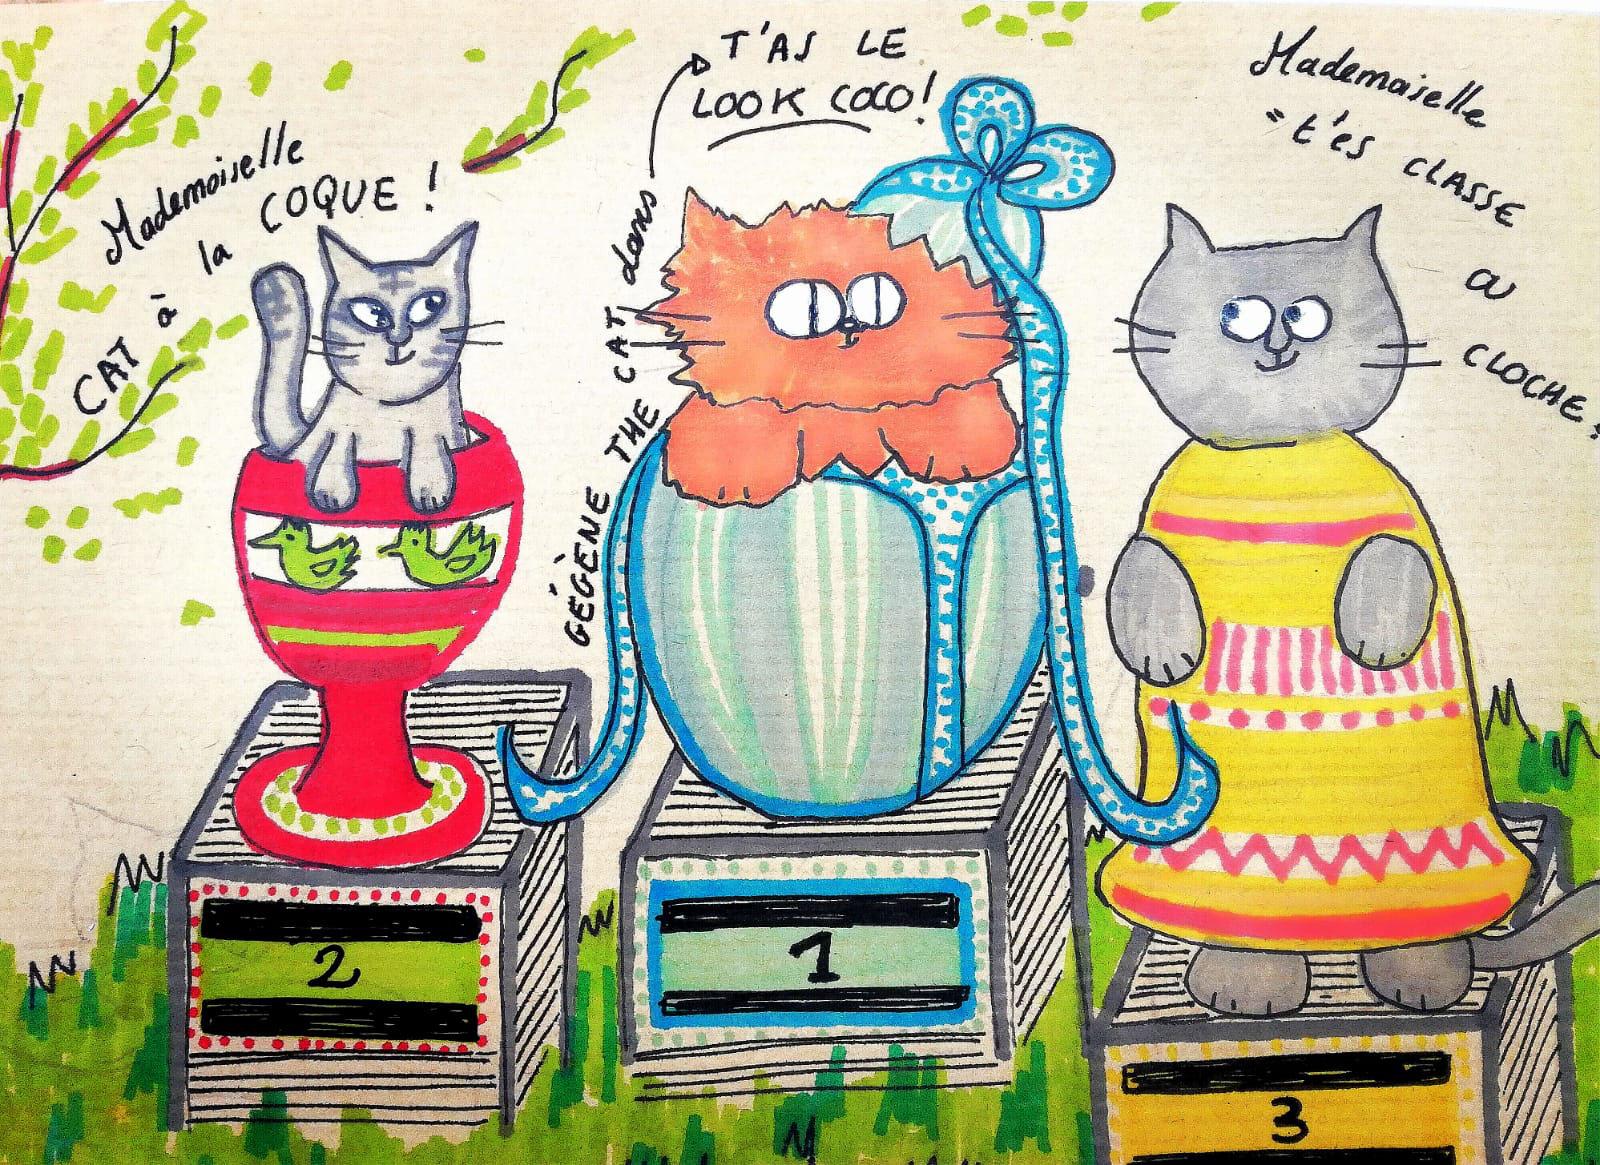 blog gegene the cat garde de chats paris. Black Bedroom Furniture Sets. Home Design Ideas